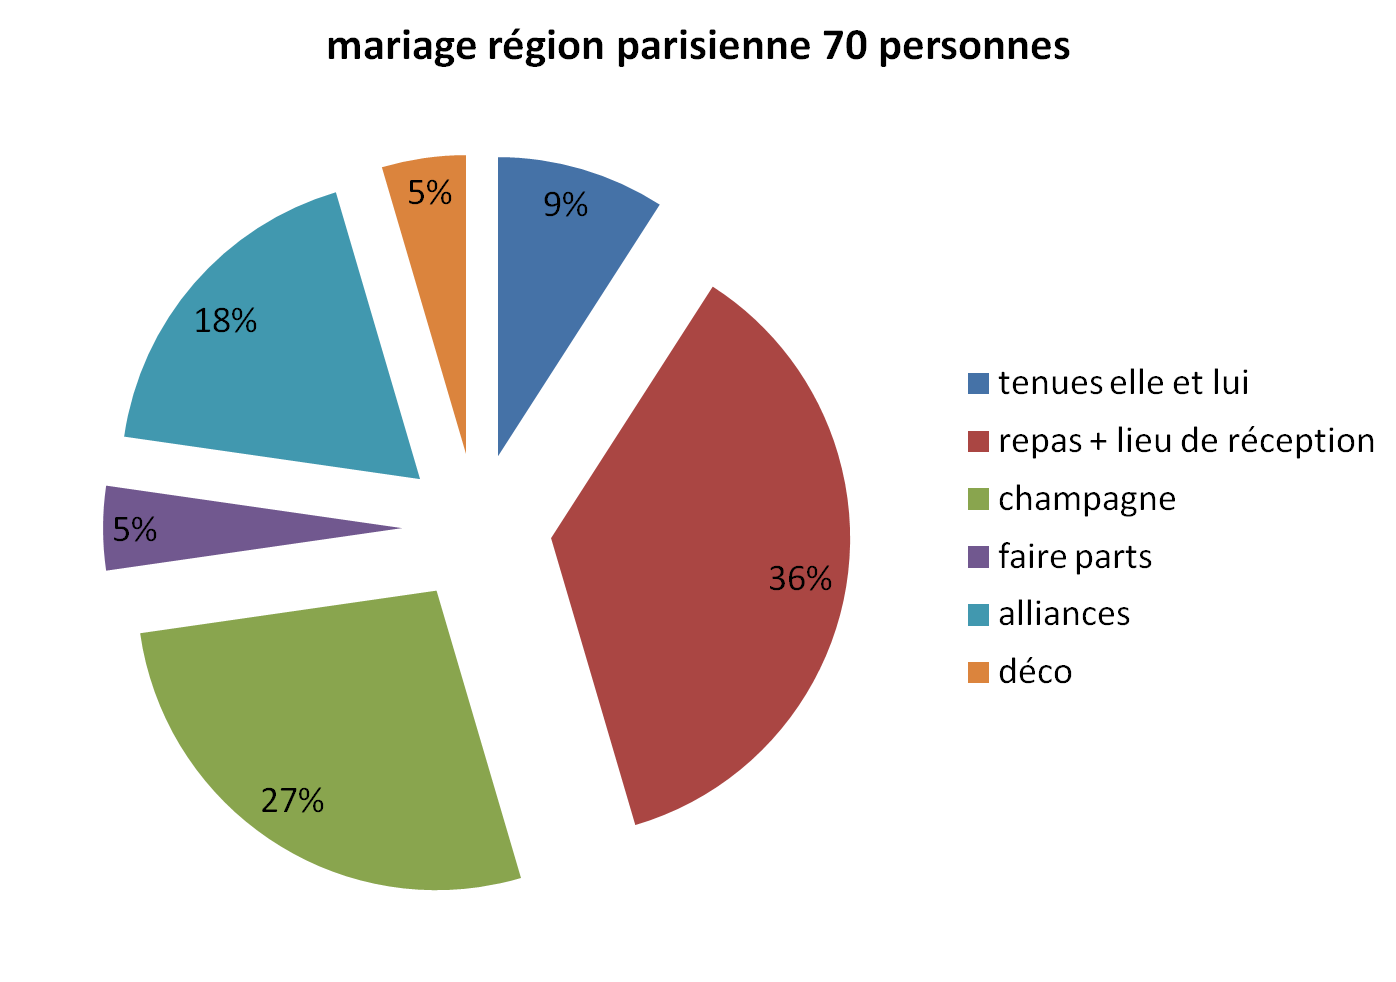 budget mariage region parisienne 70 personnes